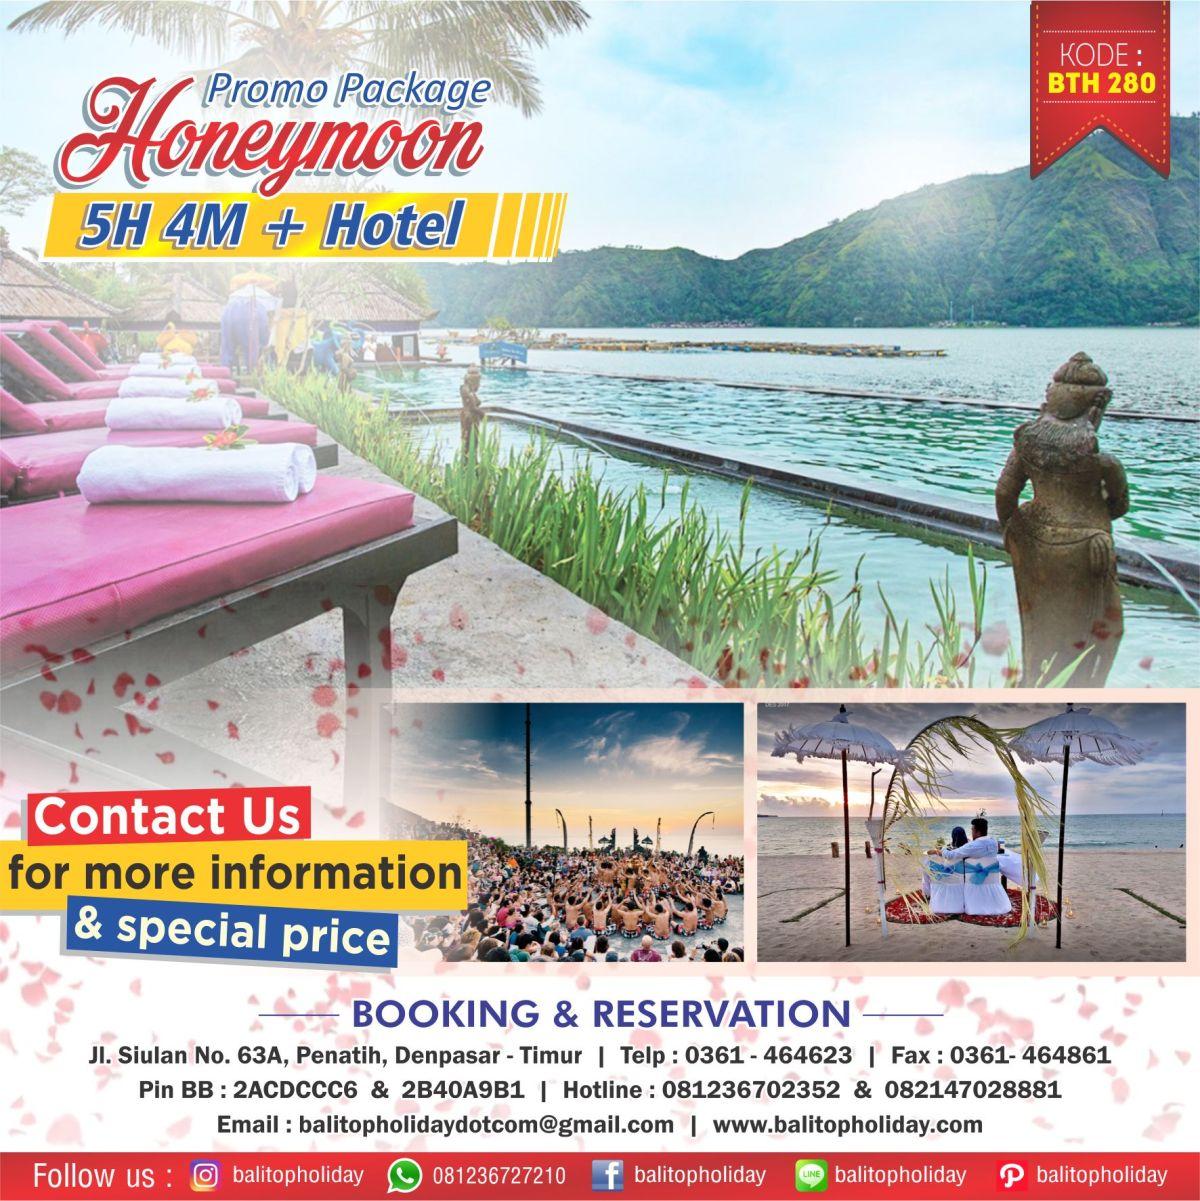 Paket Honeymoon 5 Hari 4 Malam (OPSI B ) BTH 280